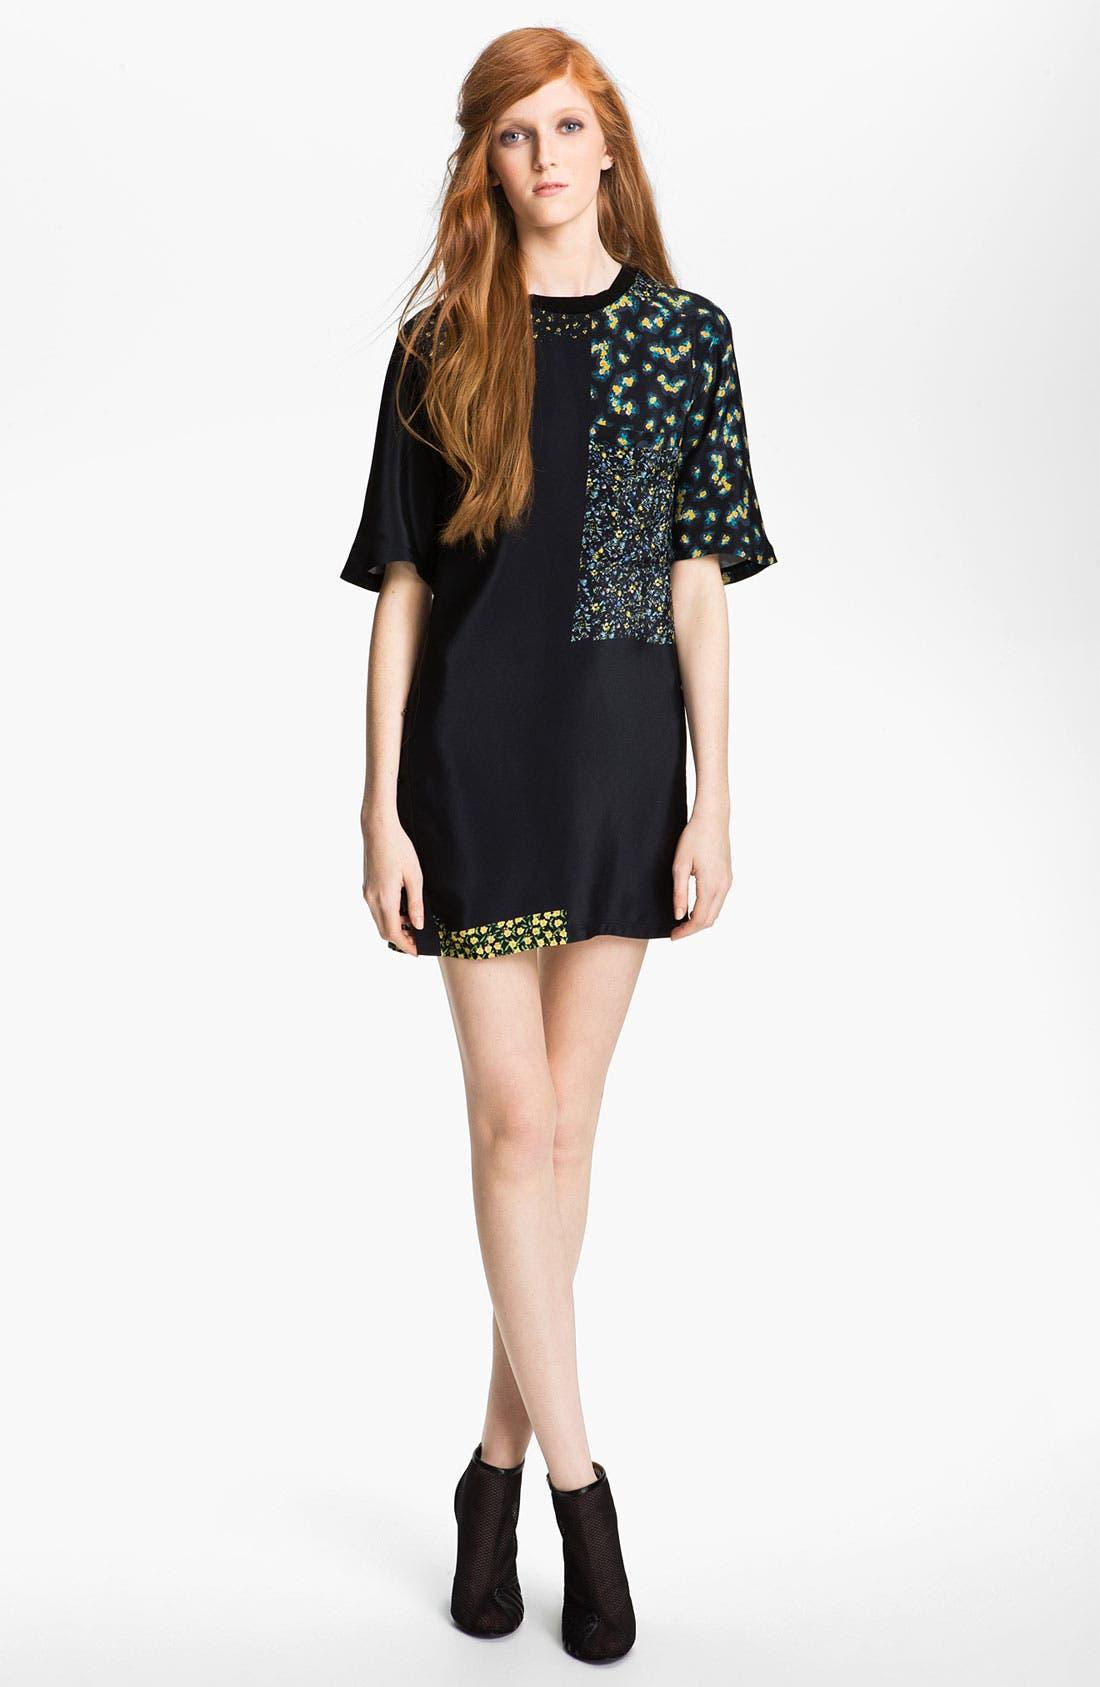 Alternate Image 1 Selected - 3.1 Phillip Lim Silk T-Shirt Dress